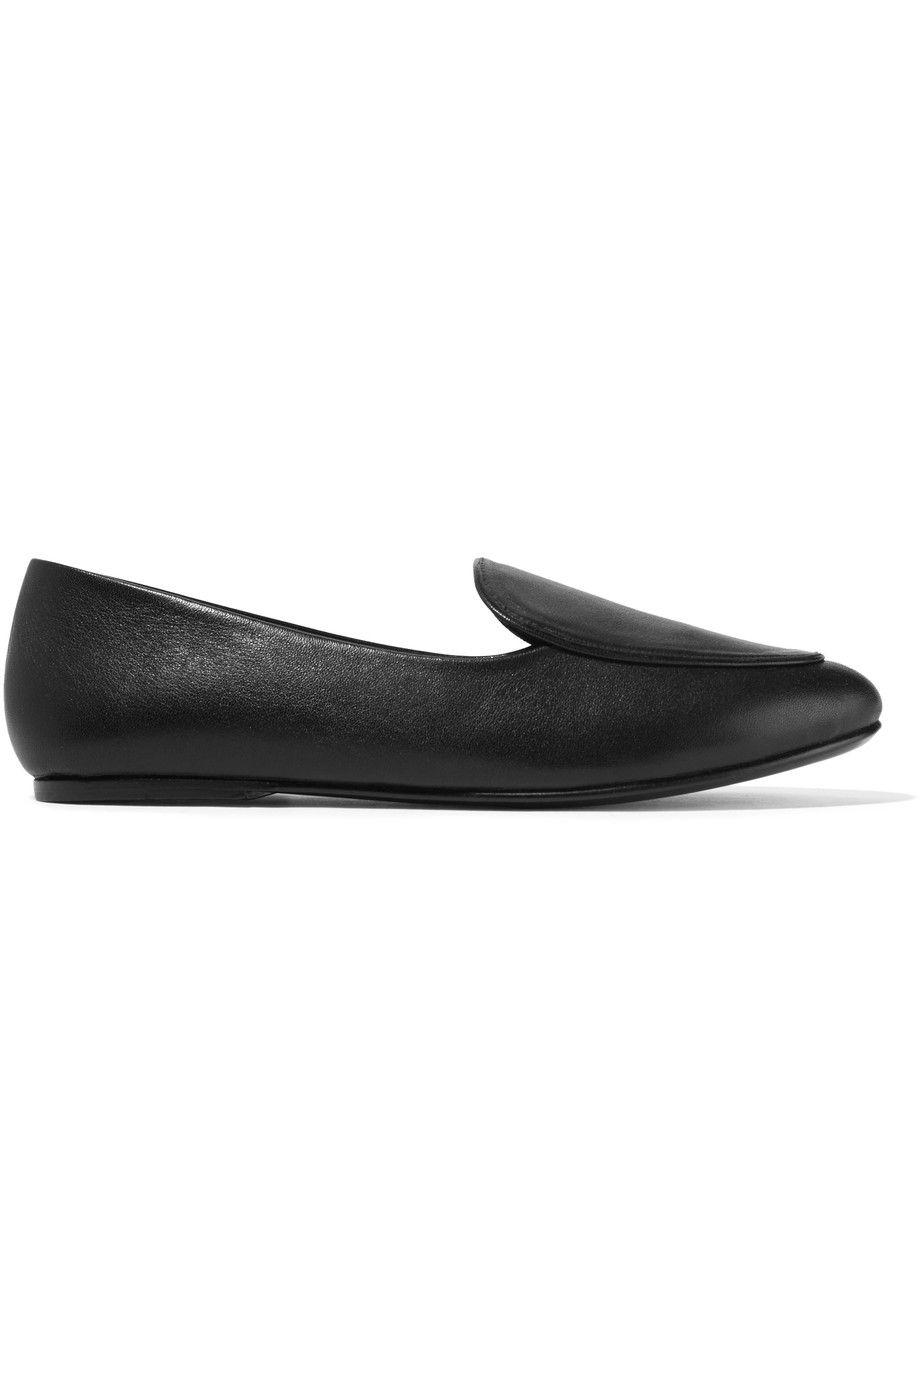 black Liza studded leather loafers Newbark Low Shipping Fee Cheap Online 93i5j7Kw7v